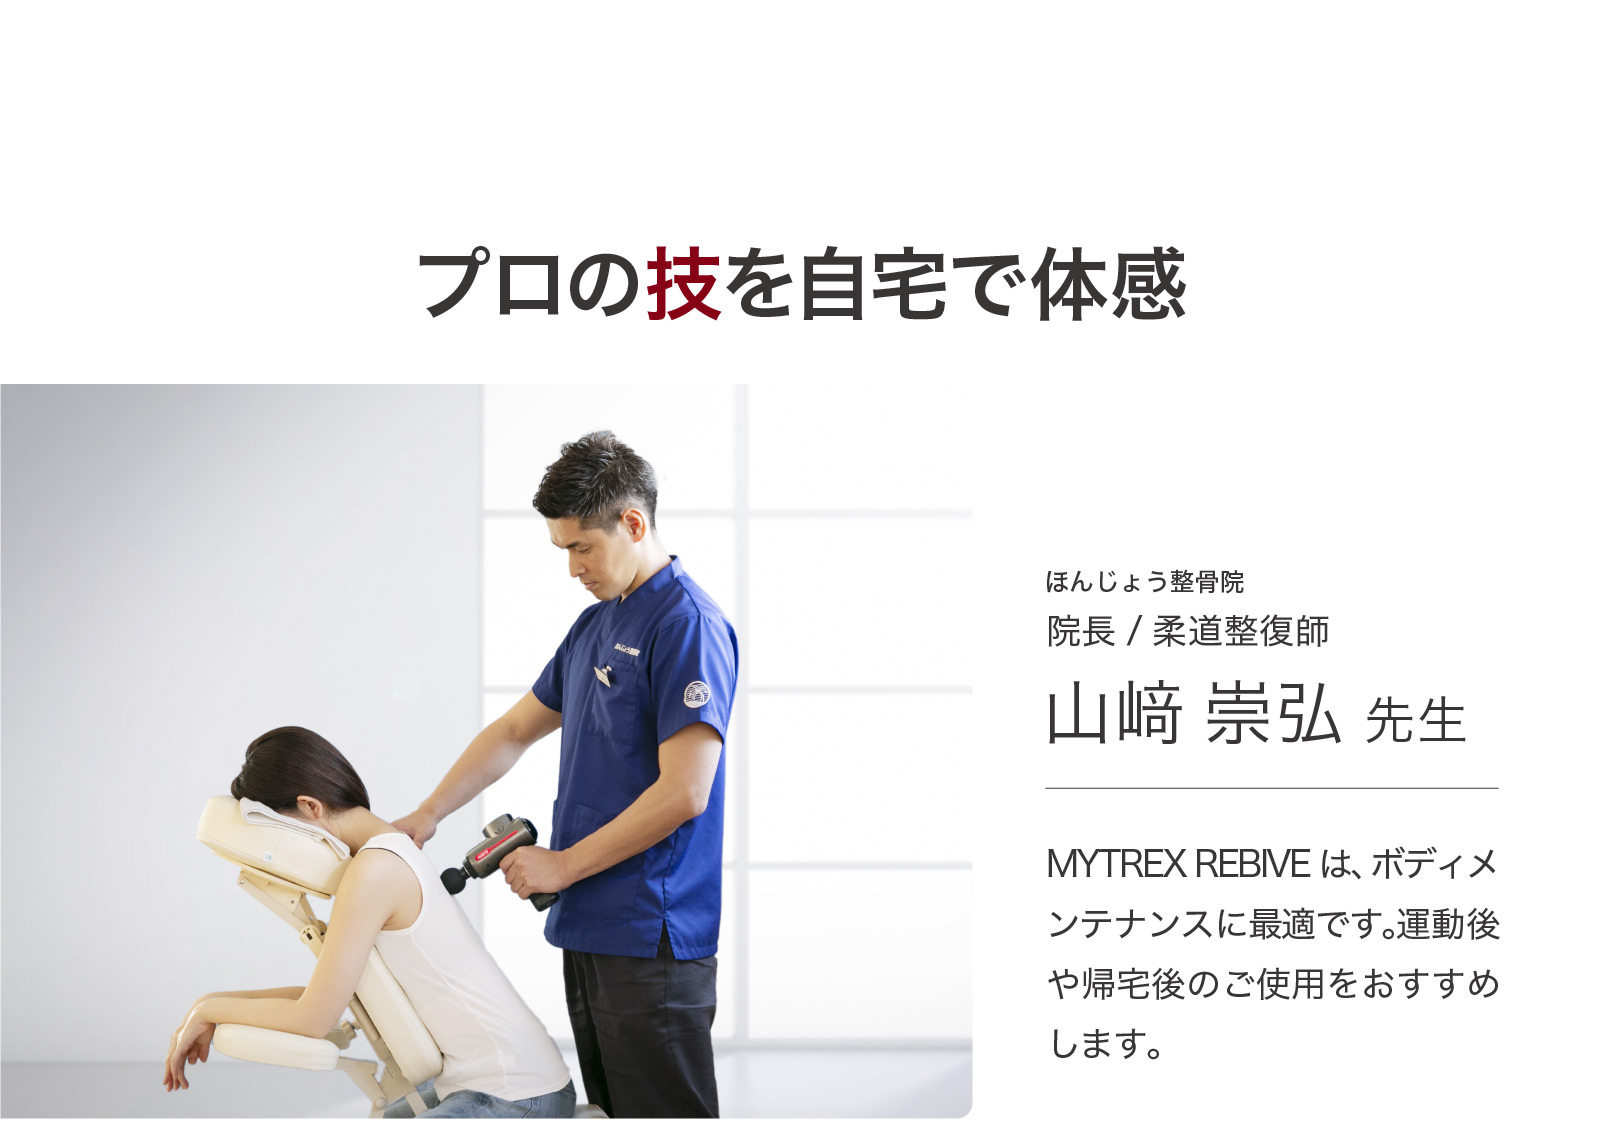 MYTREX REVIBE マイトレックス リバイブ 筋膜リリース マッサージガン